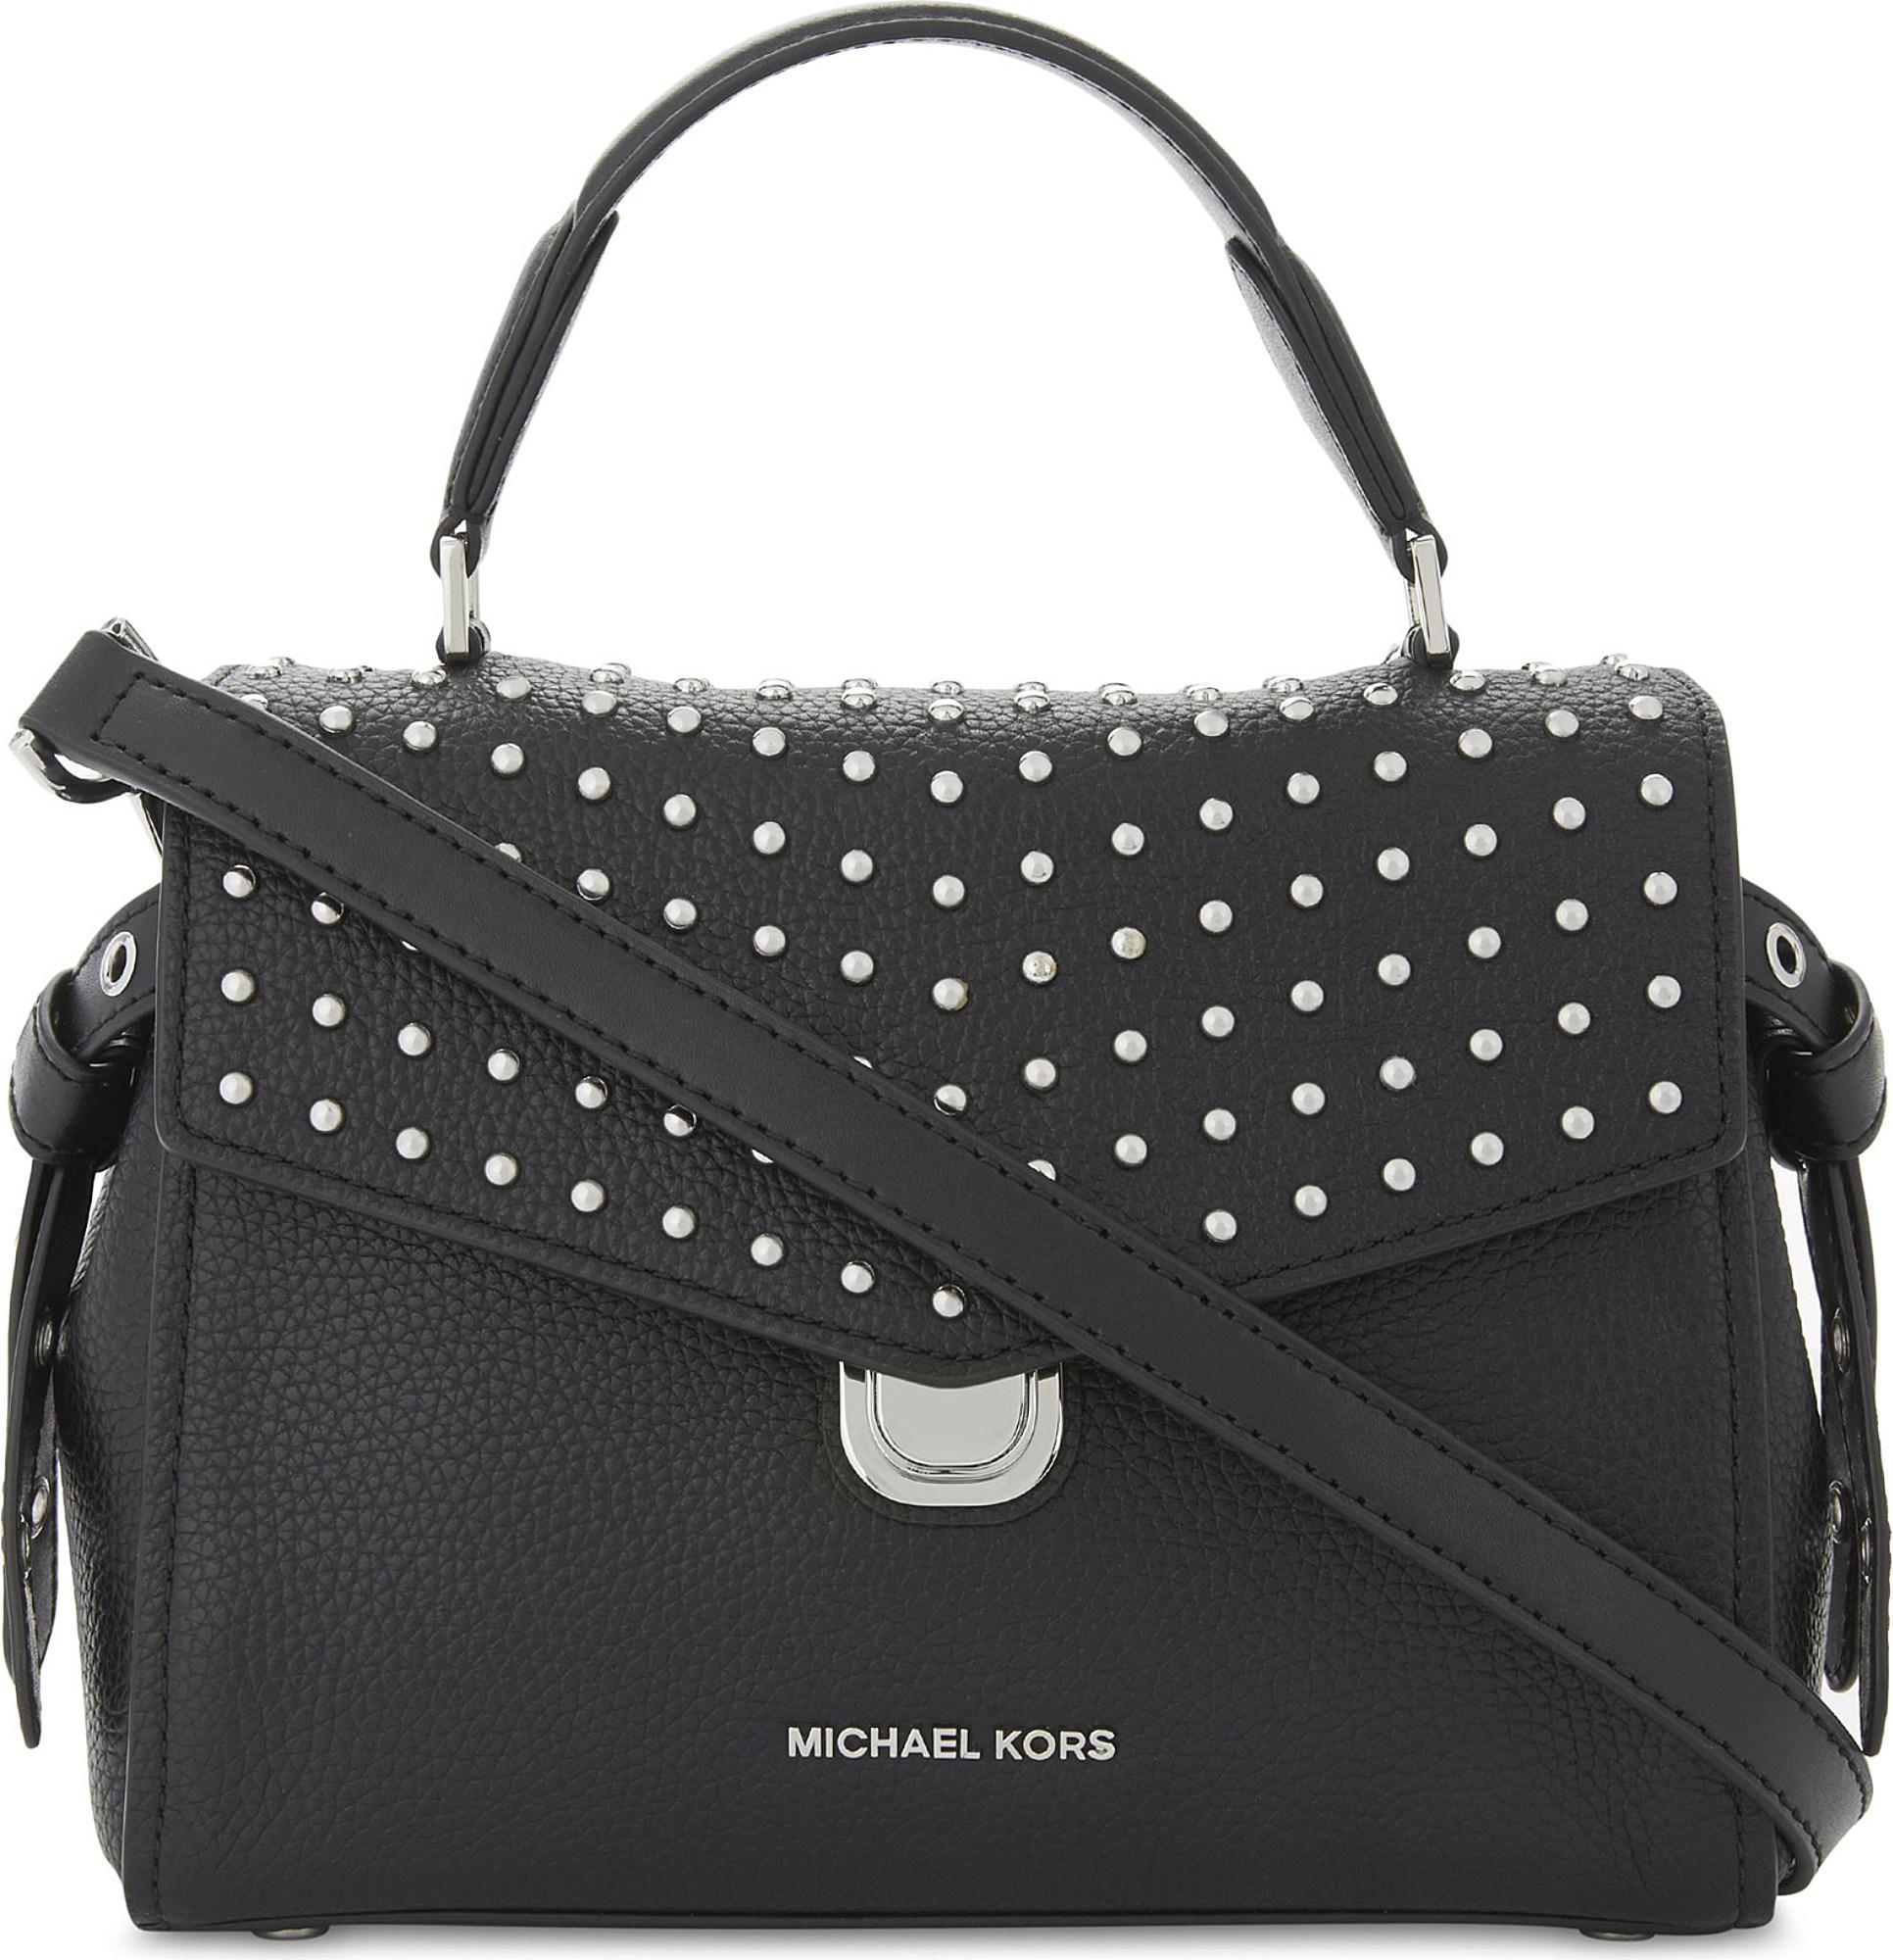 Bristol Medium Top Handle Satchel Bag in Black Pebble Leather Michael Michael Kors RHiFV